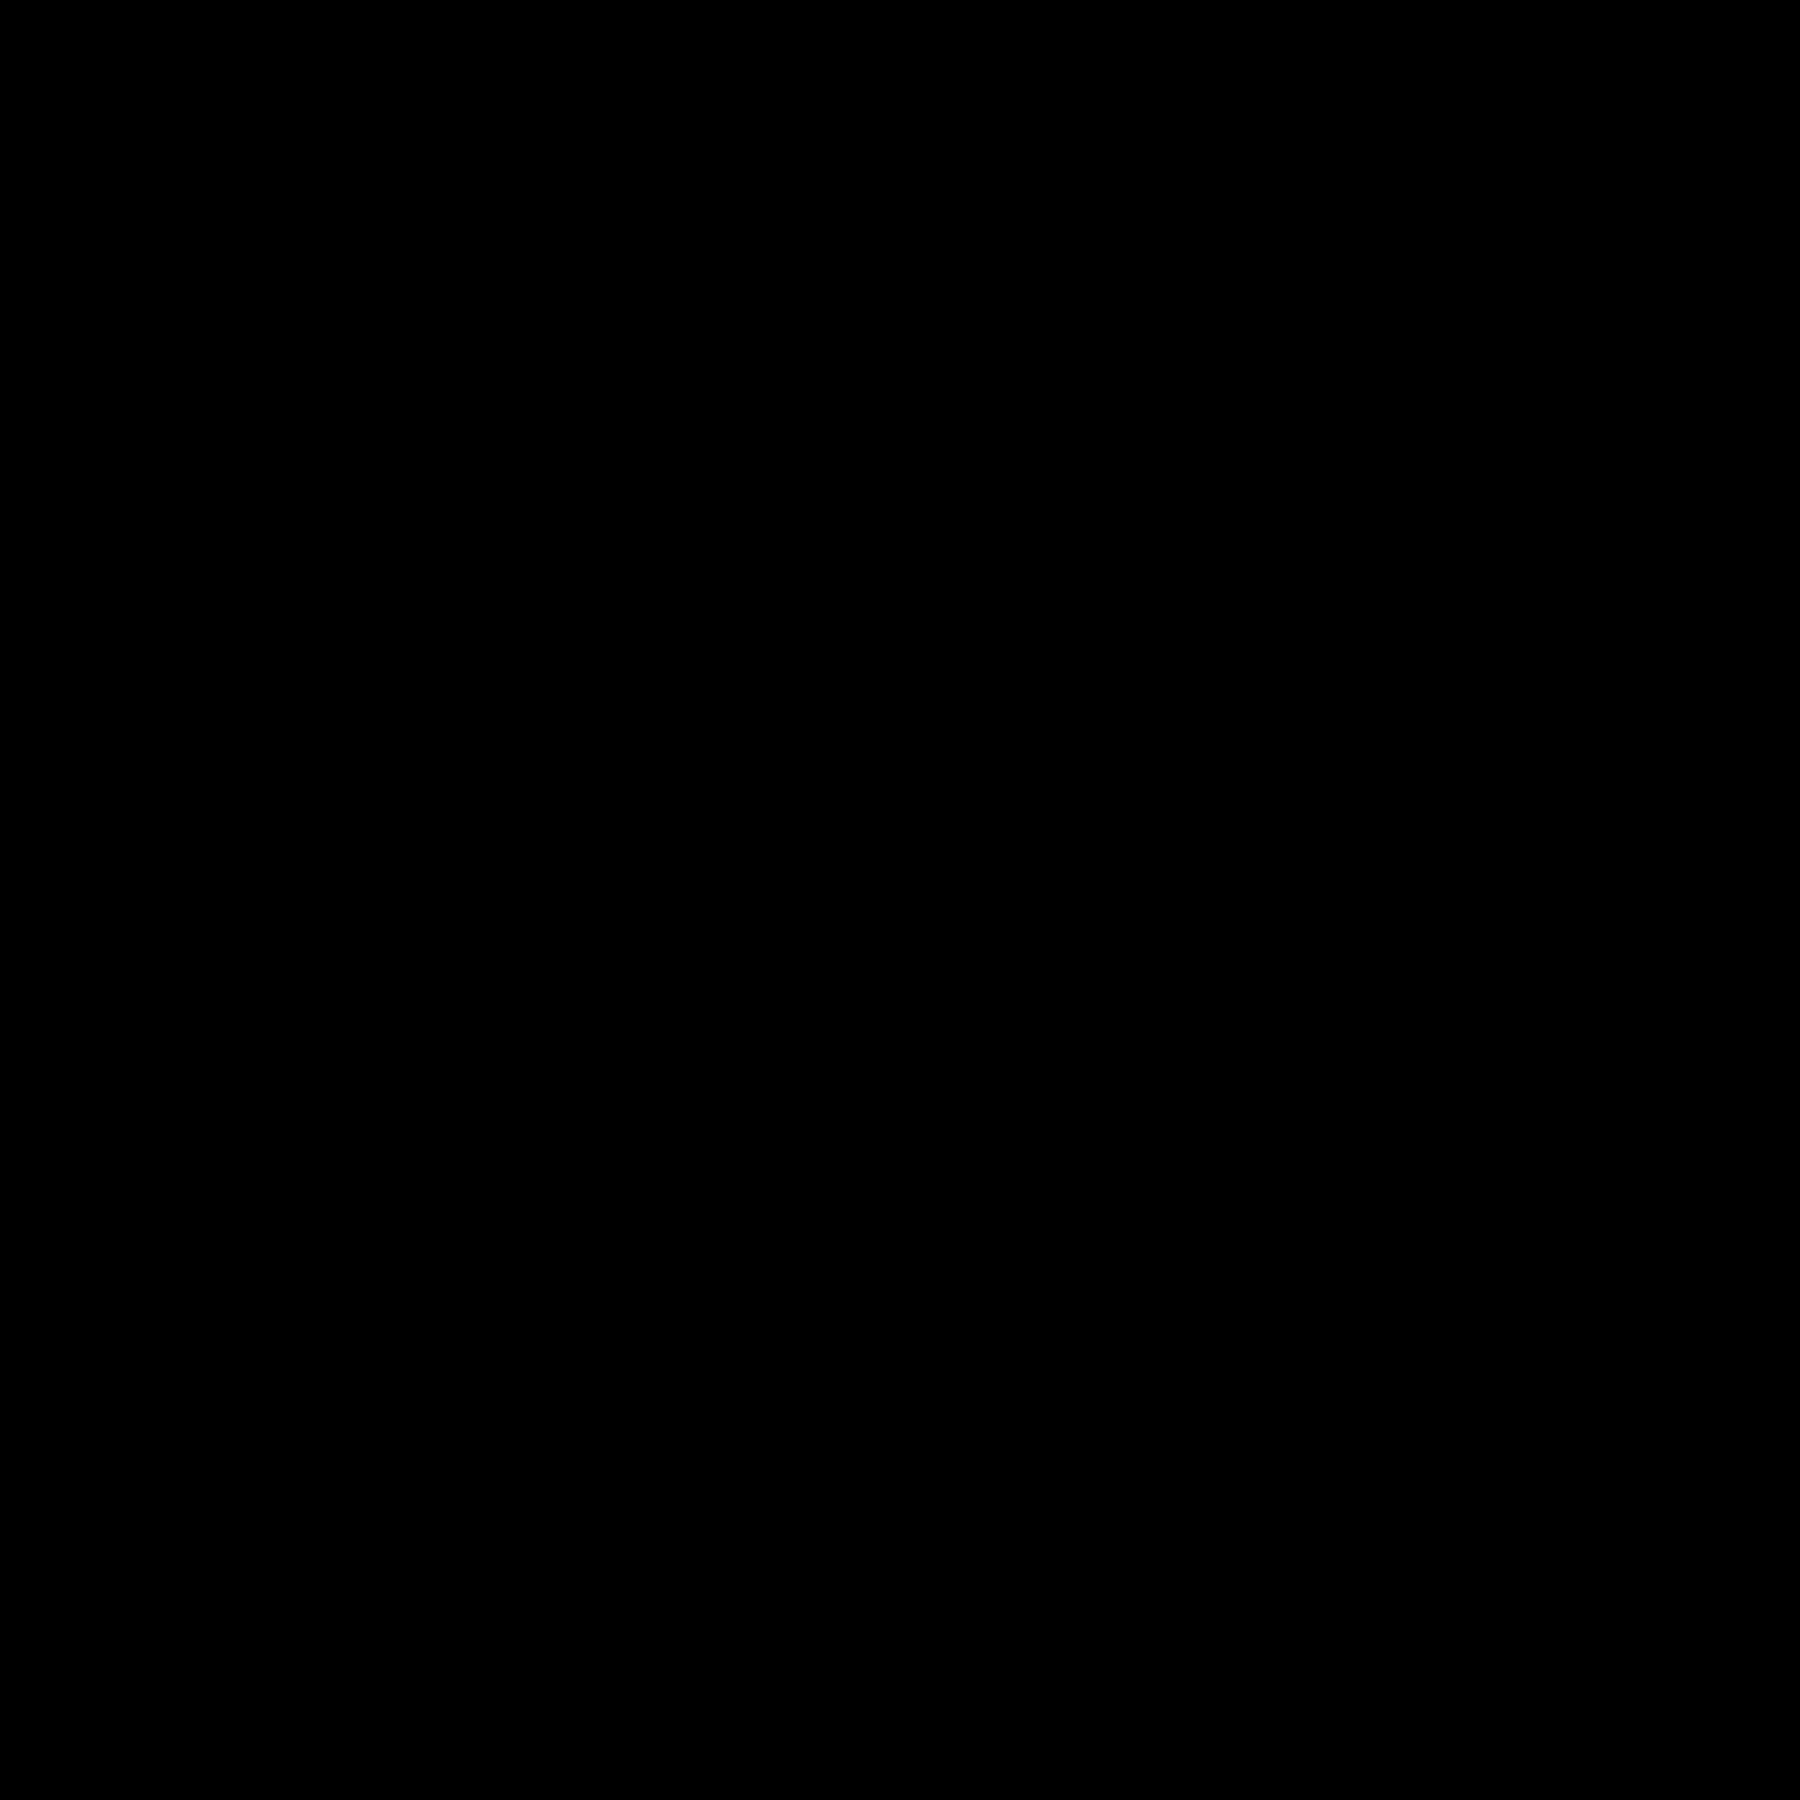 Basic Symbols-01.png